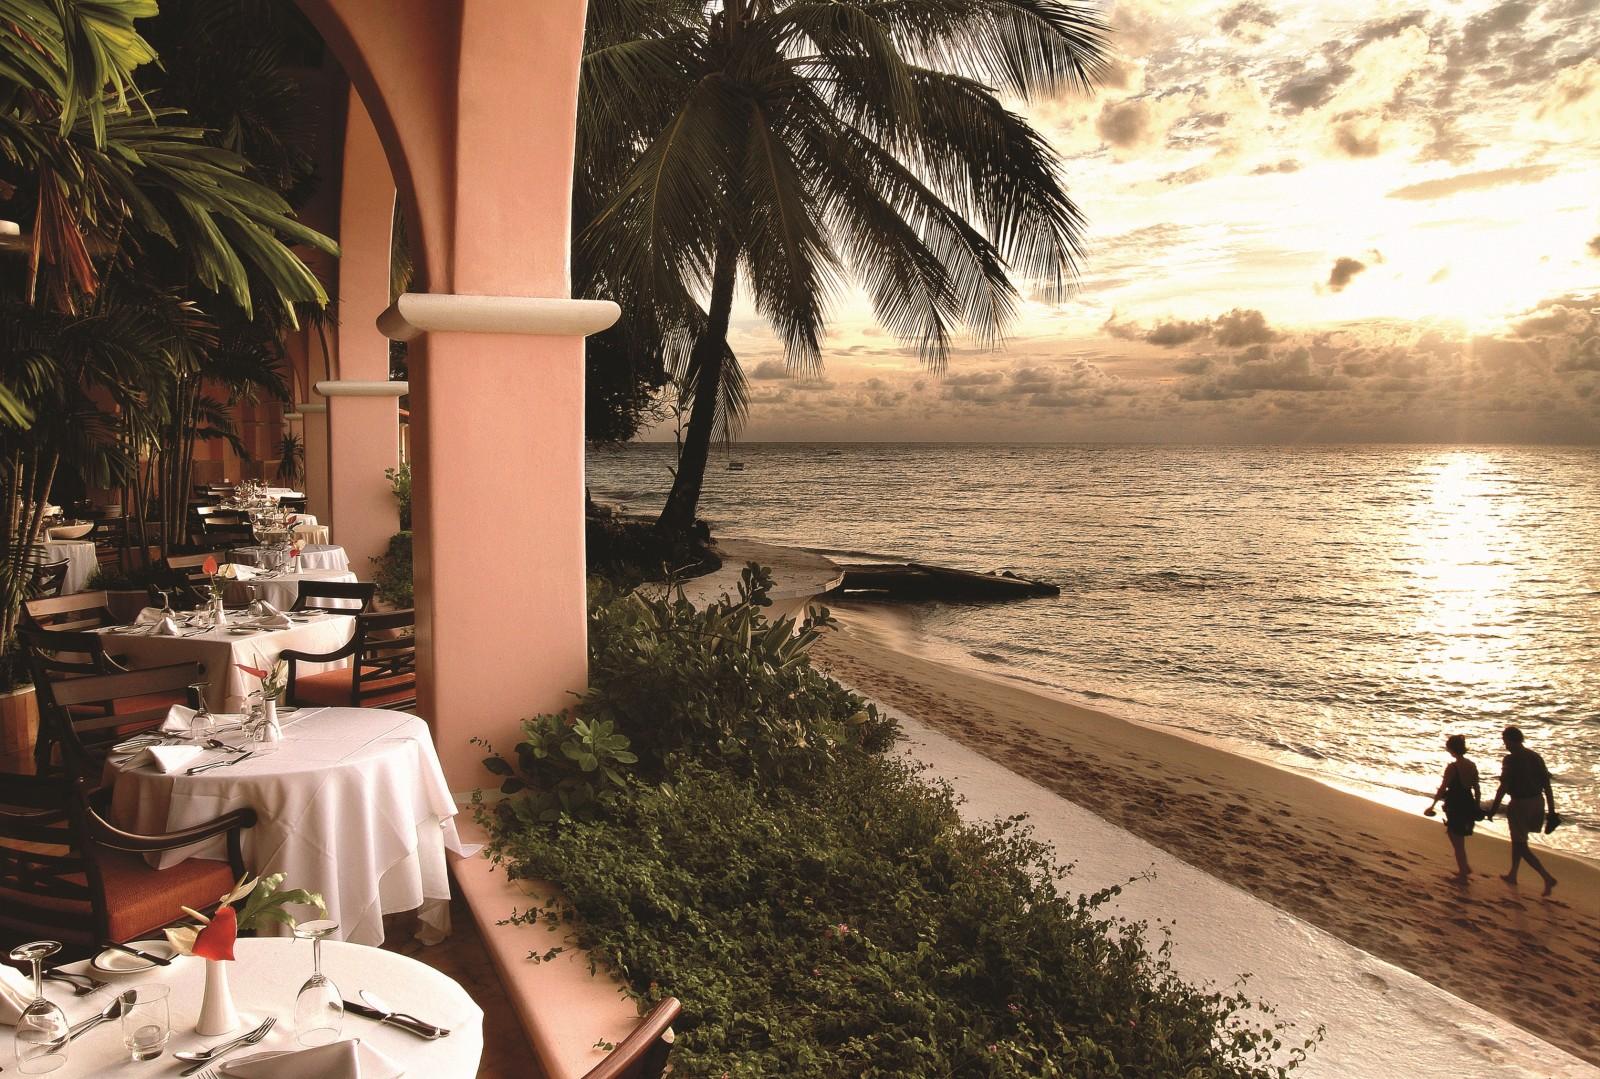 Barbados Fairmont Main image